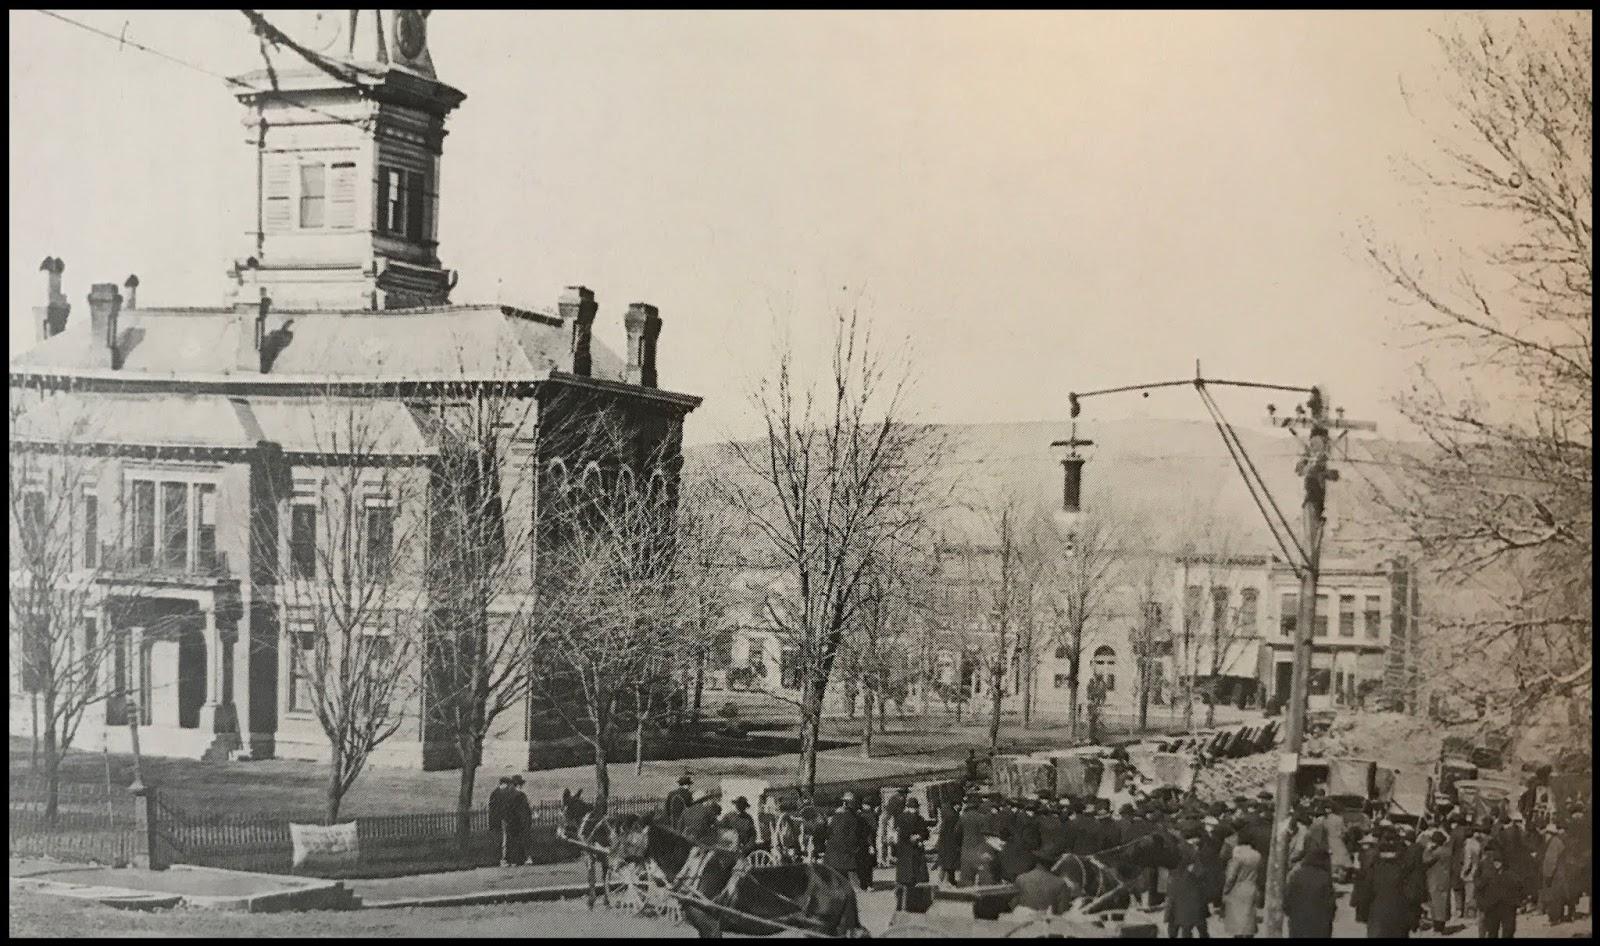 72 Scrapbooks: Part 7: Sarah Eva Howe's Stroll Through 1890s